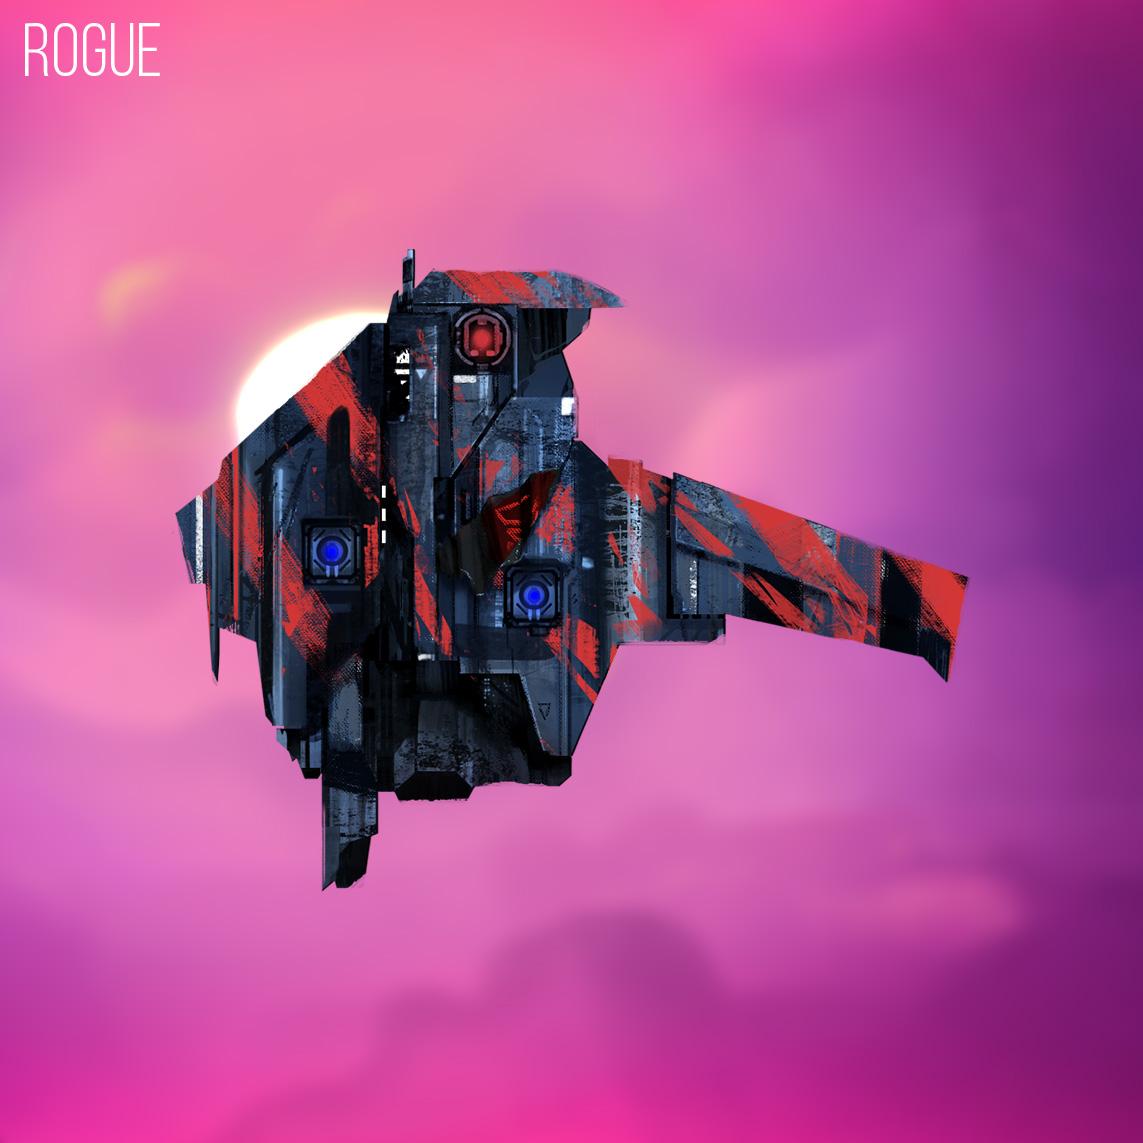 A'Kari Rogue